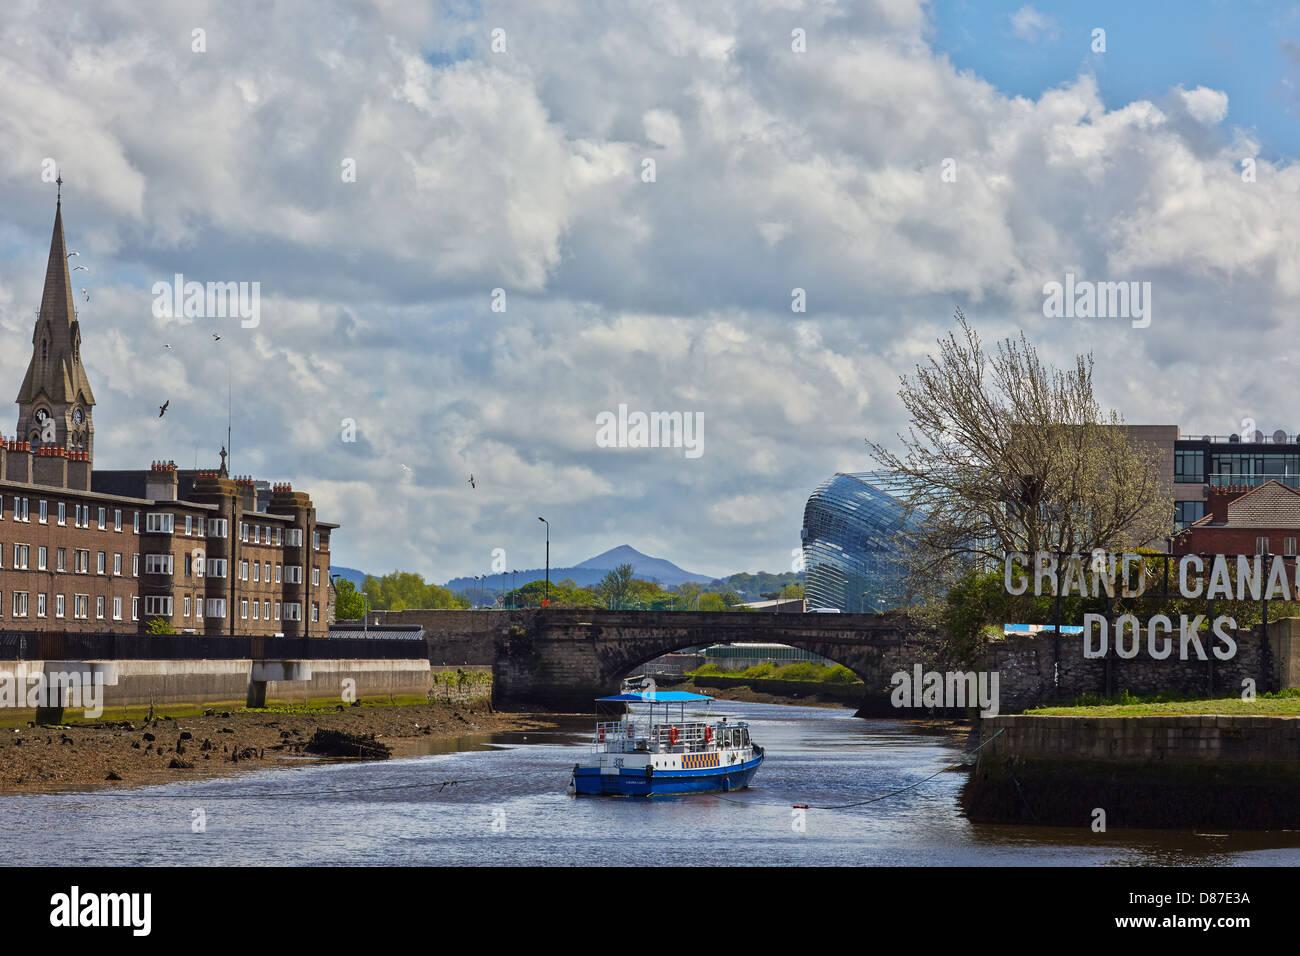 Pleasure cruiser on  the Grand Canal docks Dublin, with the Aviva Stadium in the background. Dublin, Ireland - Stock Image